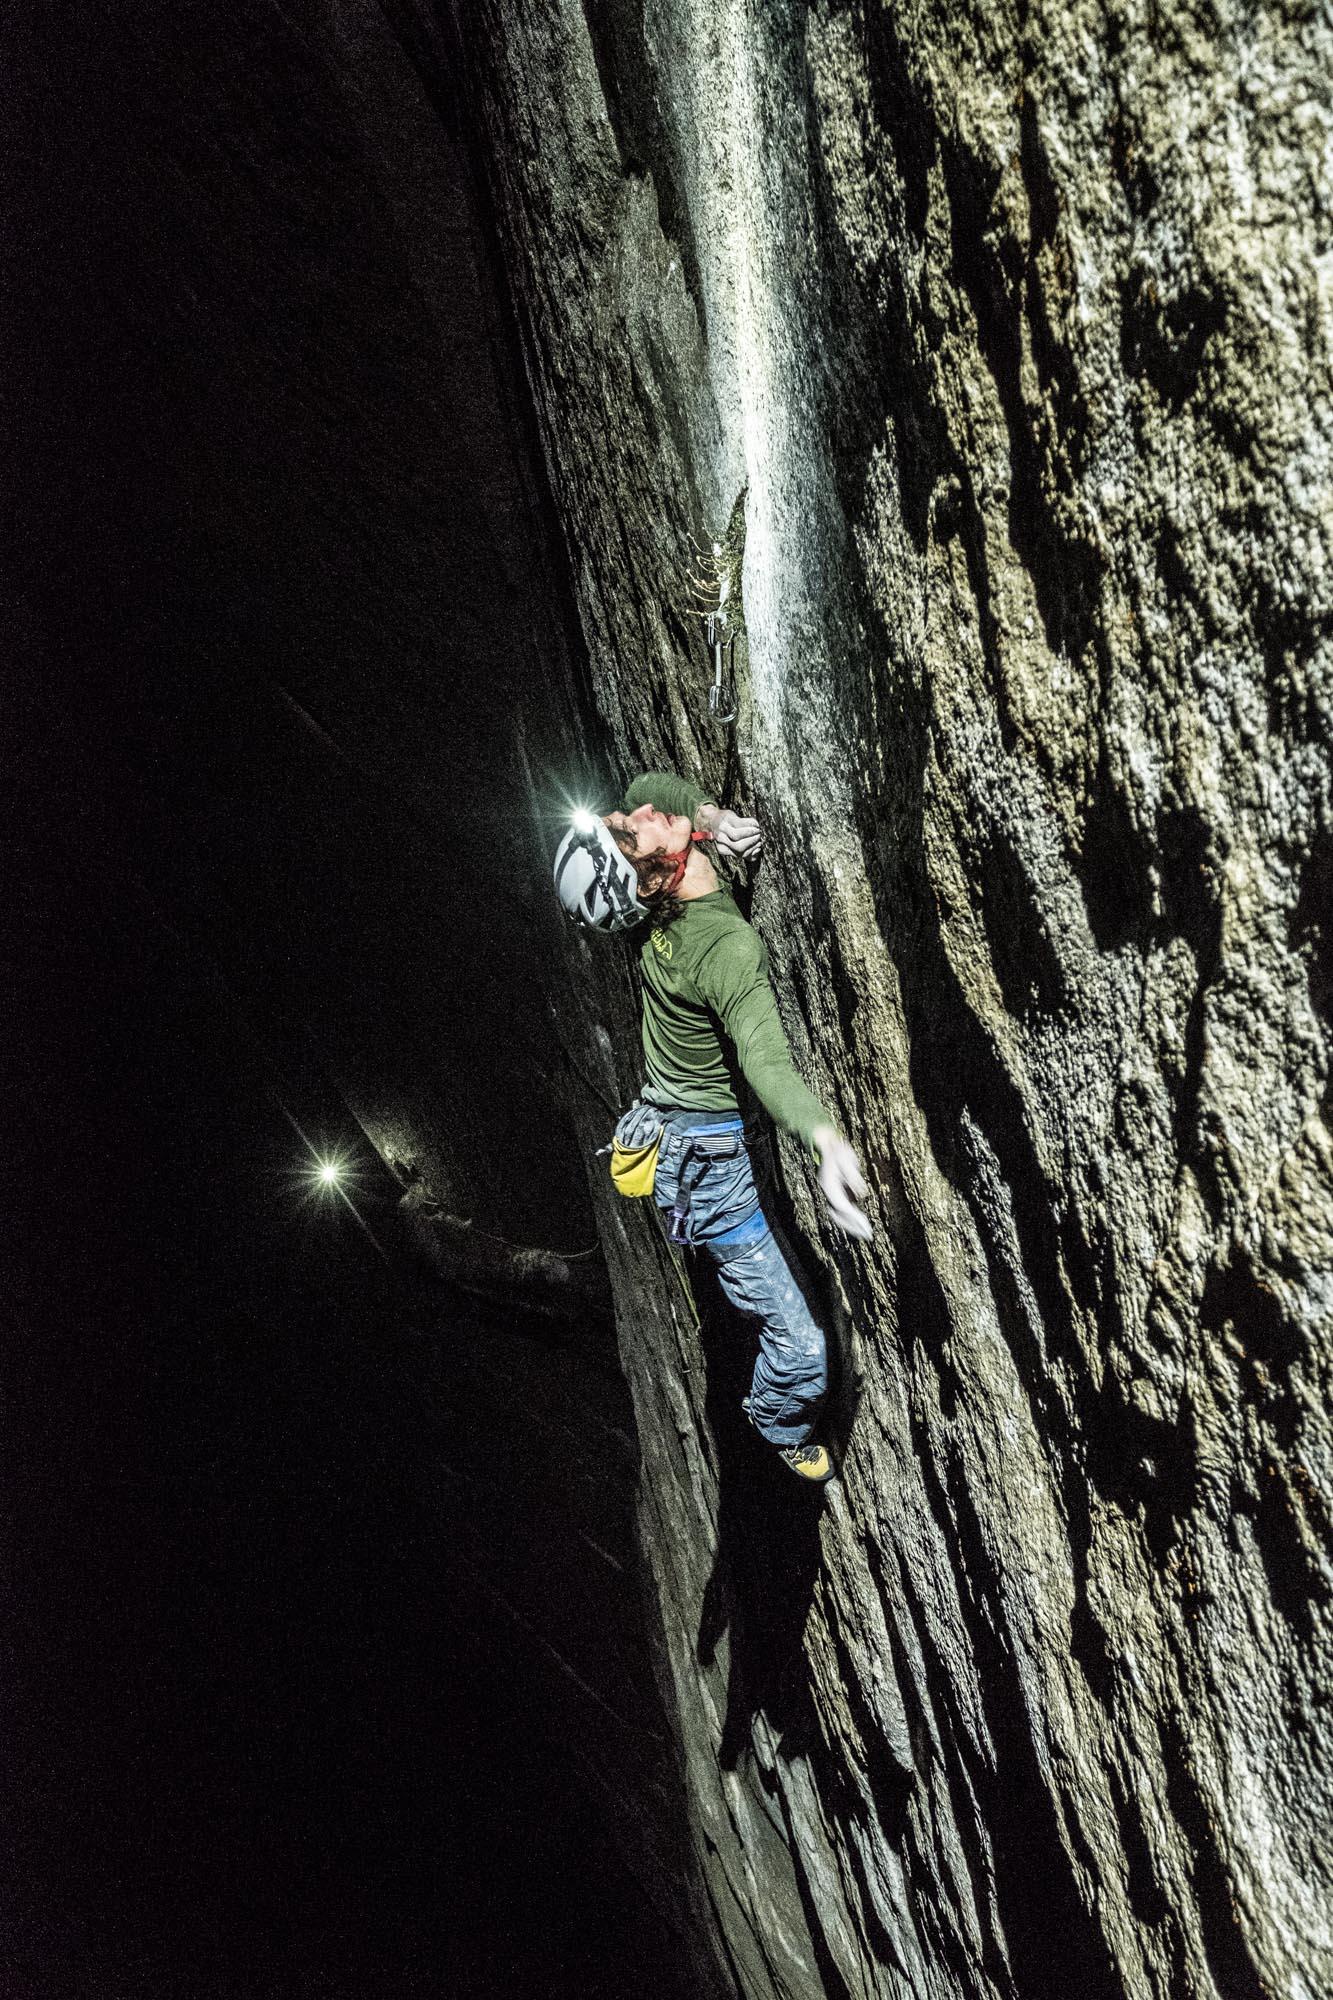 Ondra climbs Pitch 21 (5.13d) by headlamp. [Photo] Heinz Zak and Black Diamond Equipment